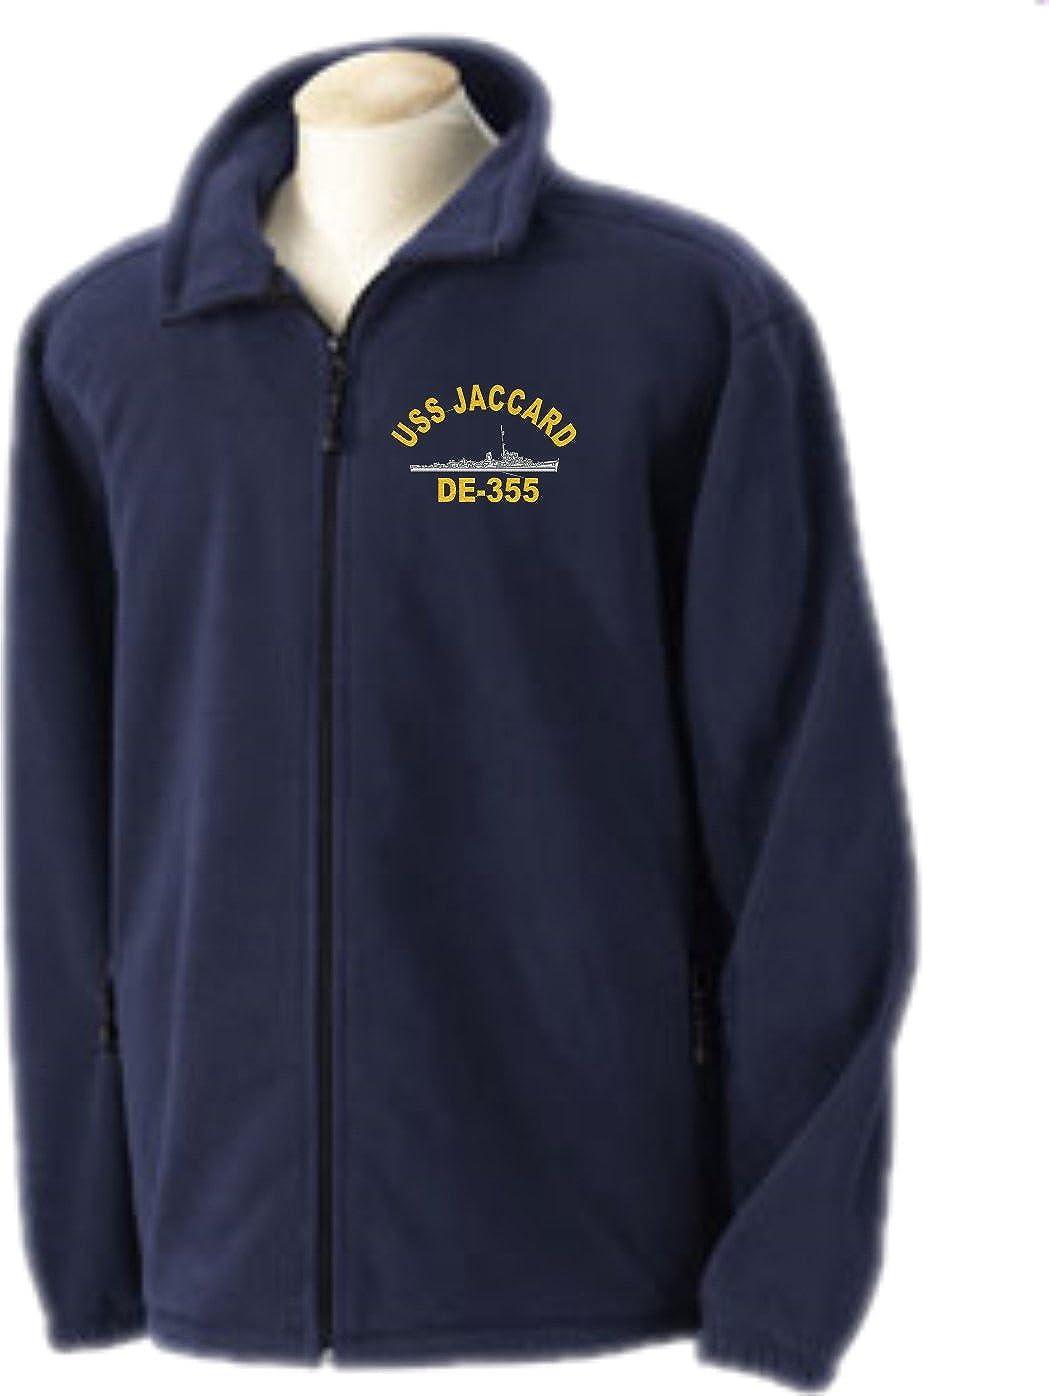 Custom Military Apparel USS JACCARD DE-355 Embroidered Fleece Jacket Sizes SMALL-4X